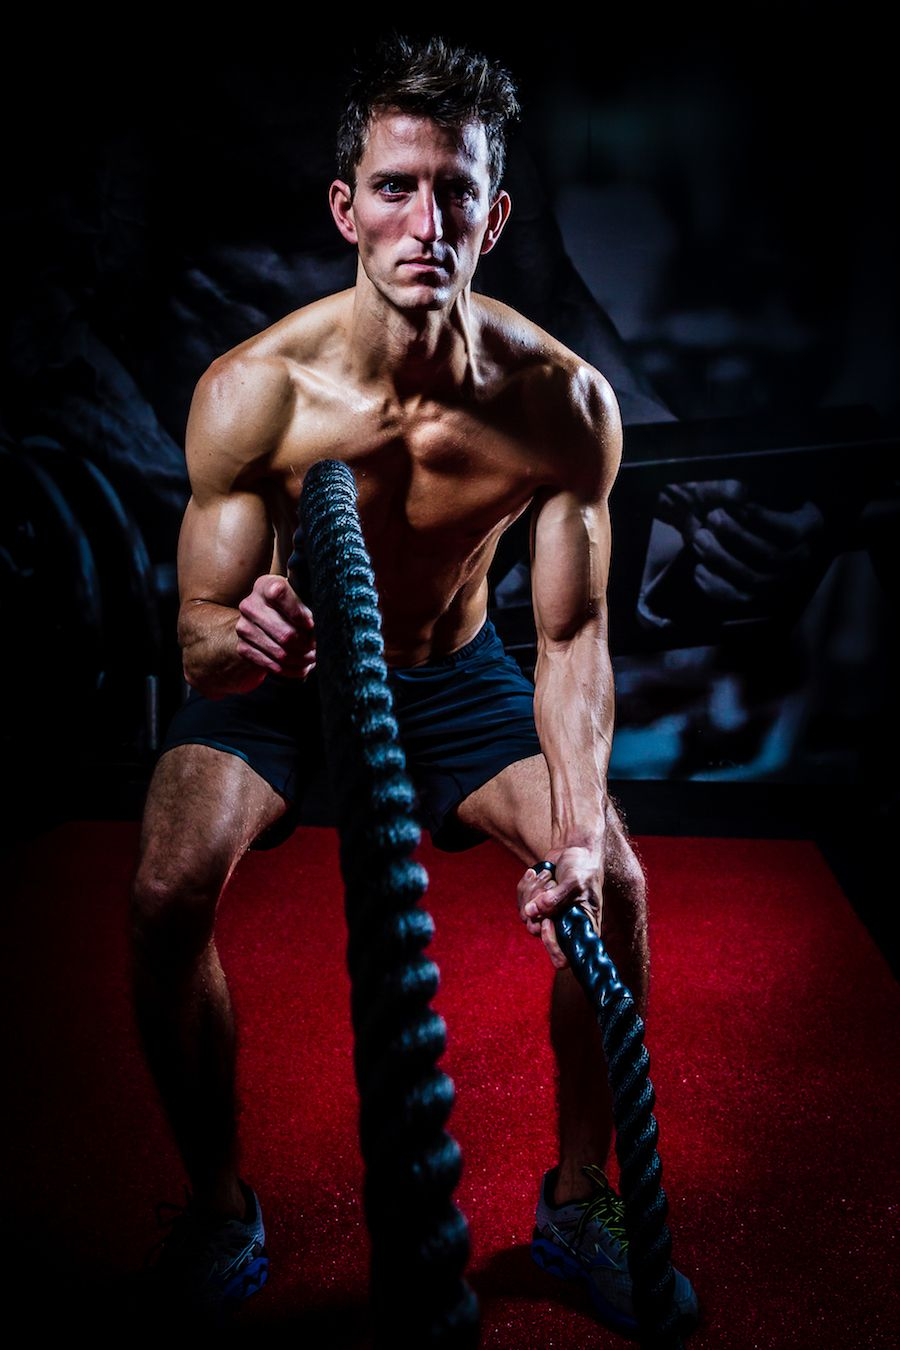 Mark 8 week transformation - battle ropes